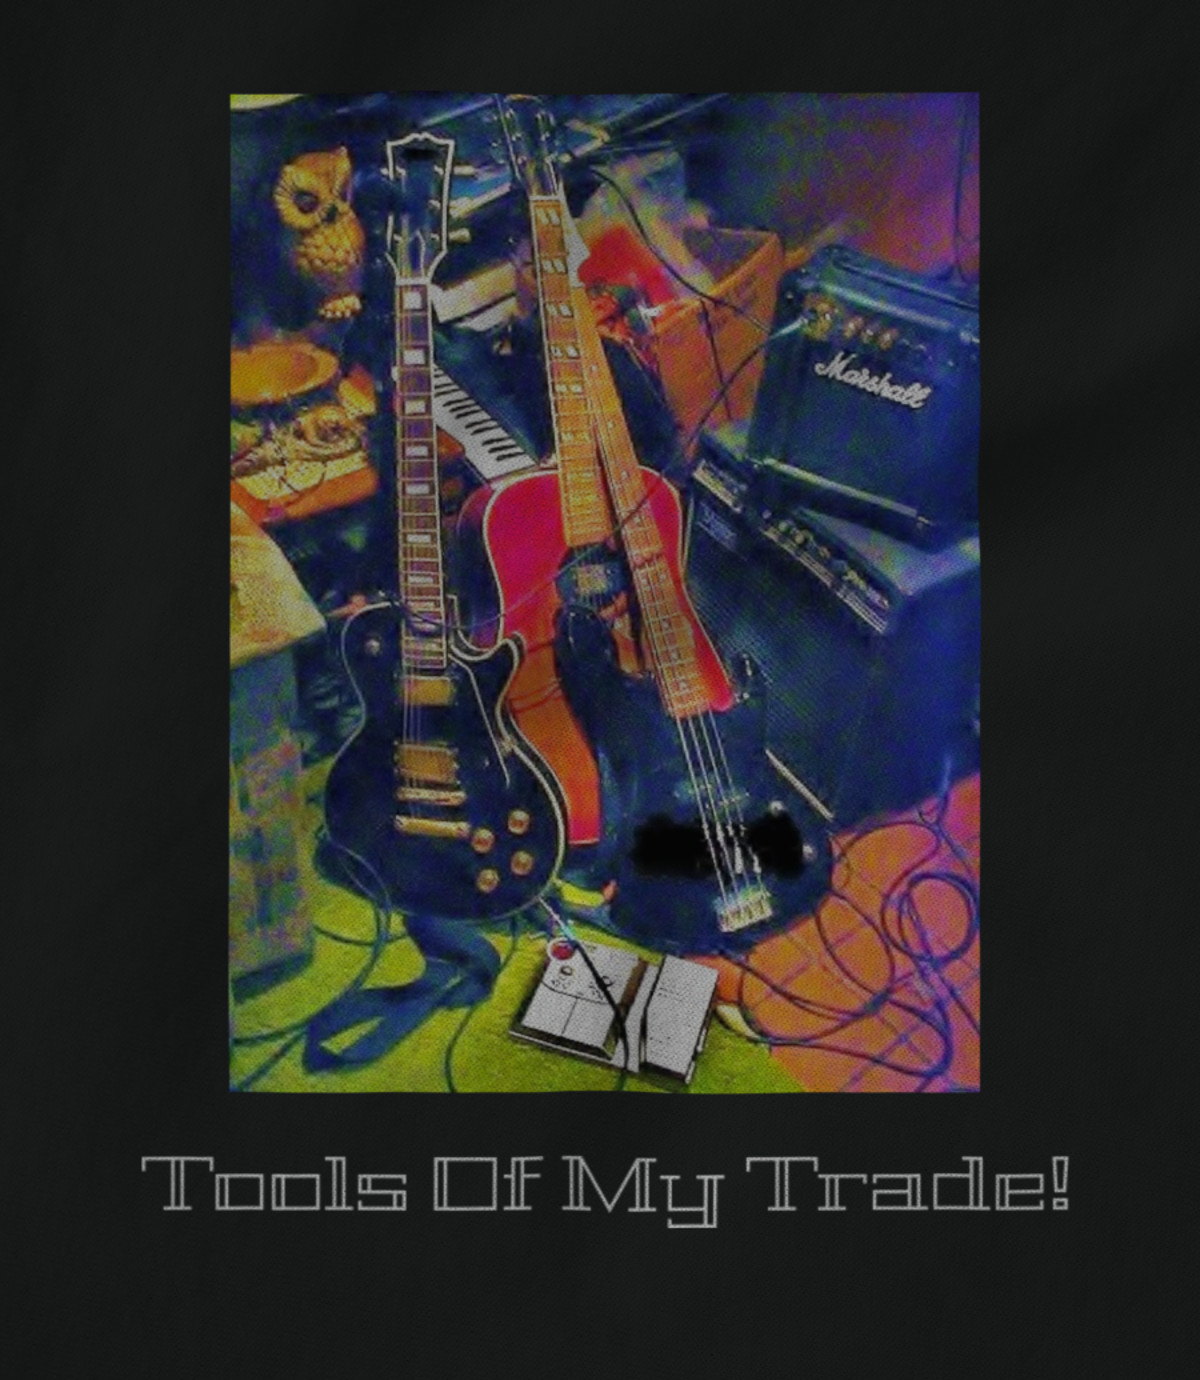 Matthew f  blowers iii tools of my trade  1505393261